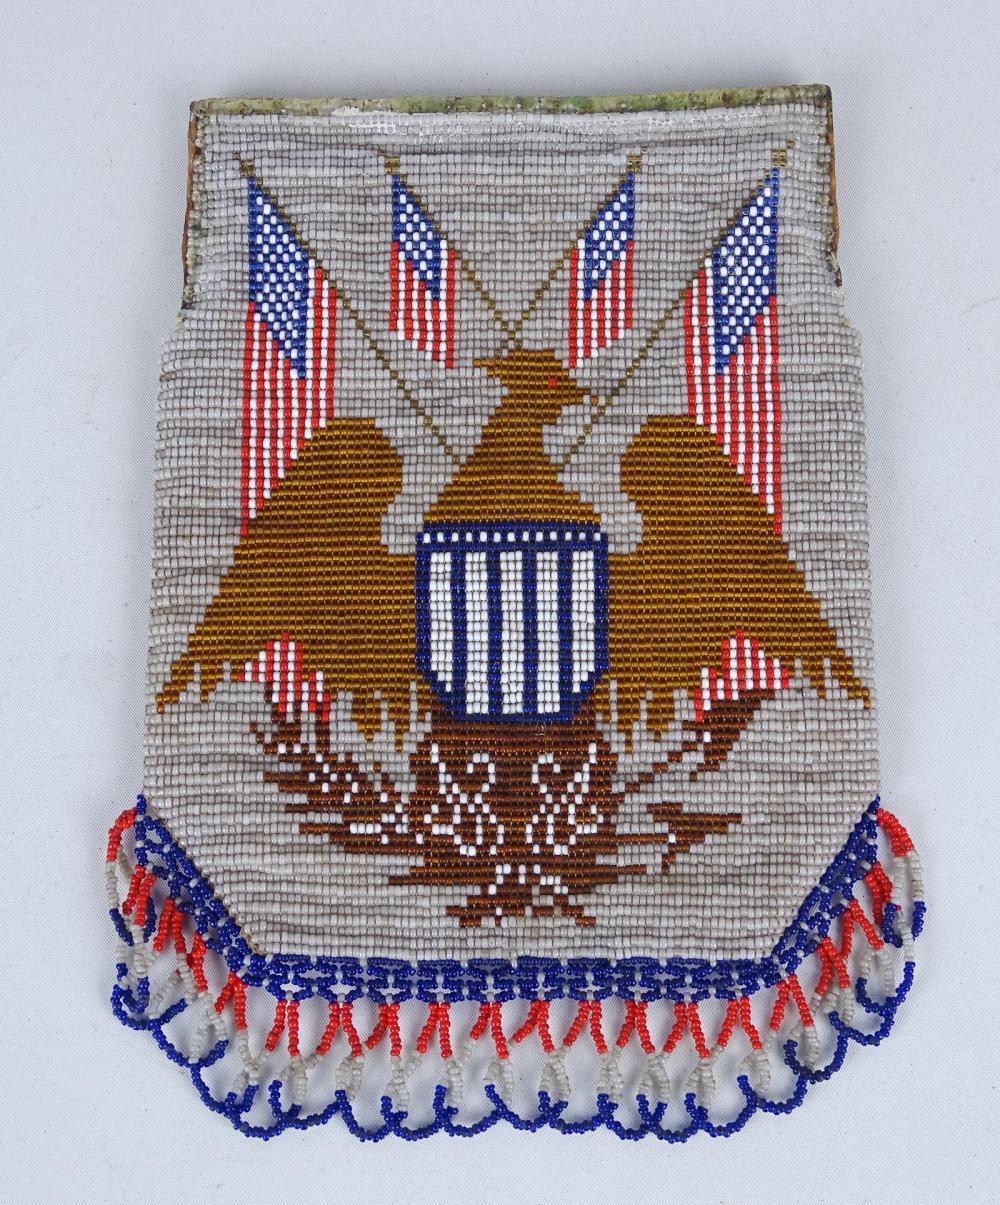 Early Patriotic Beaded Bag